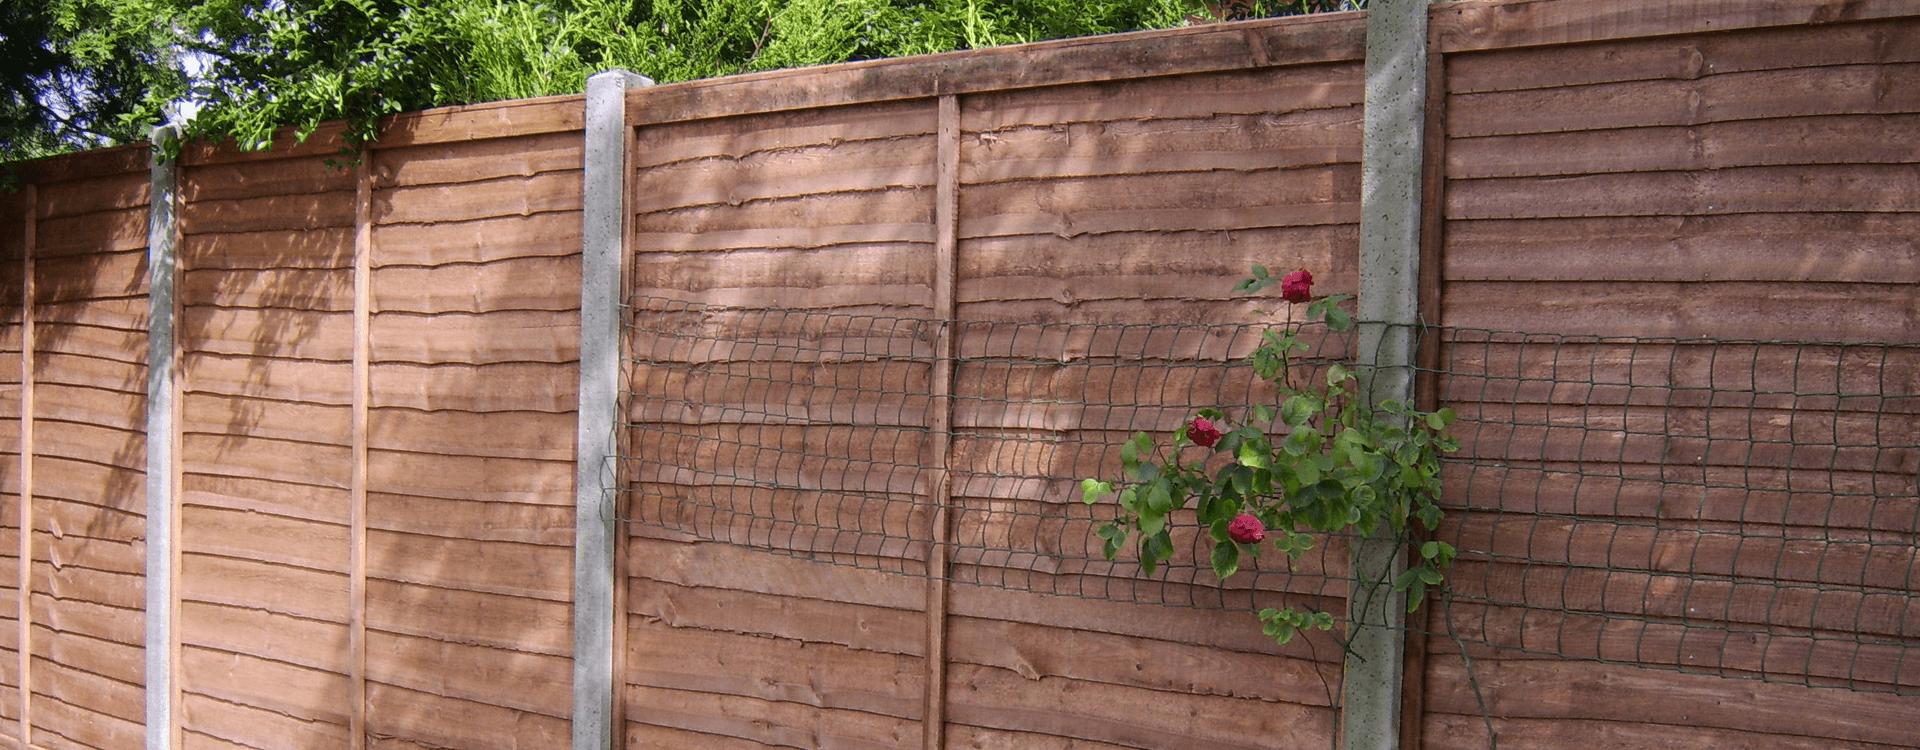 Garden fencing | Fencing Products Ltd, Wokingham